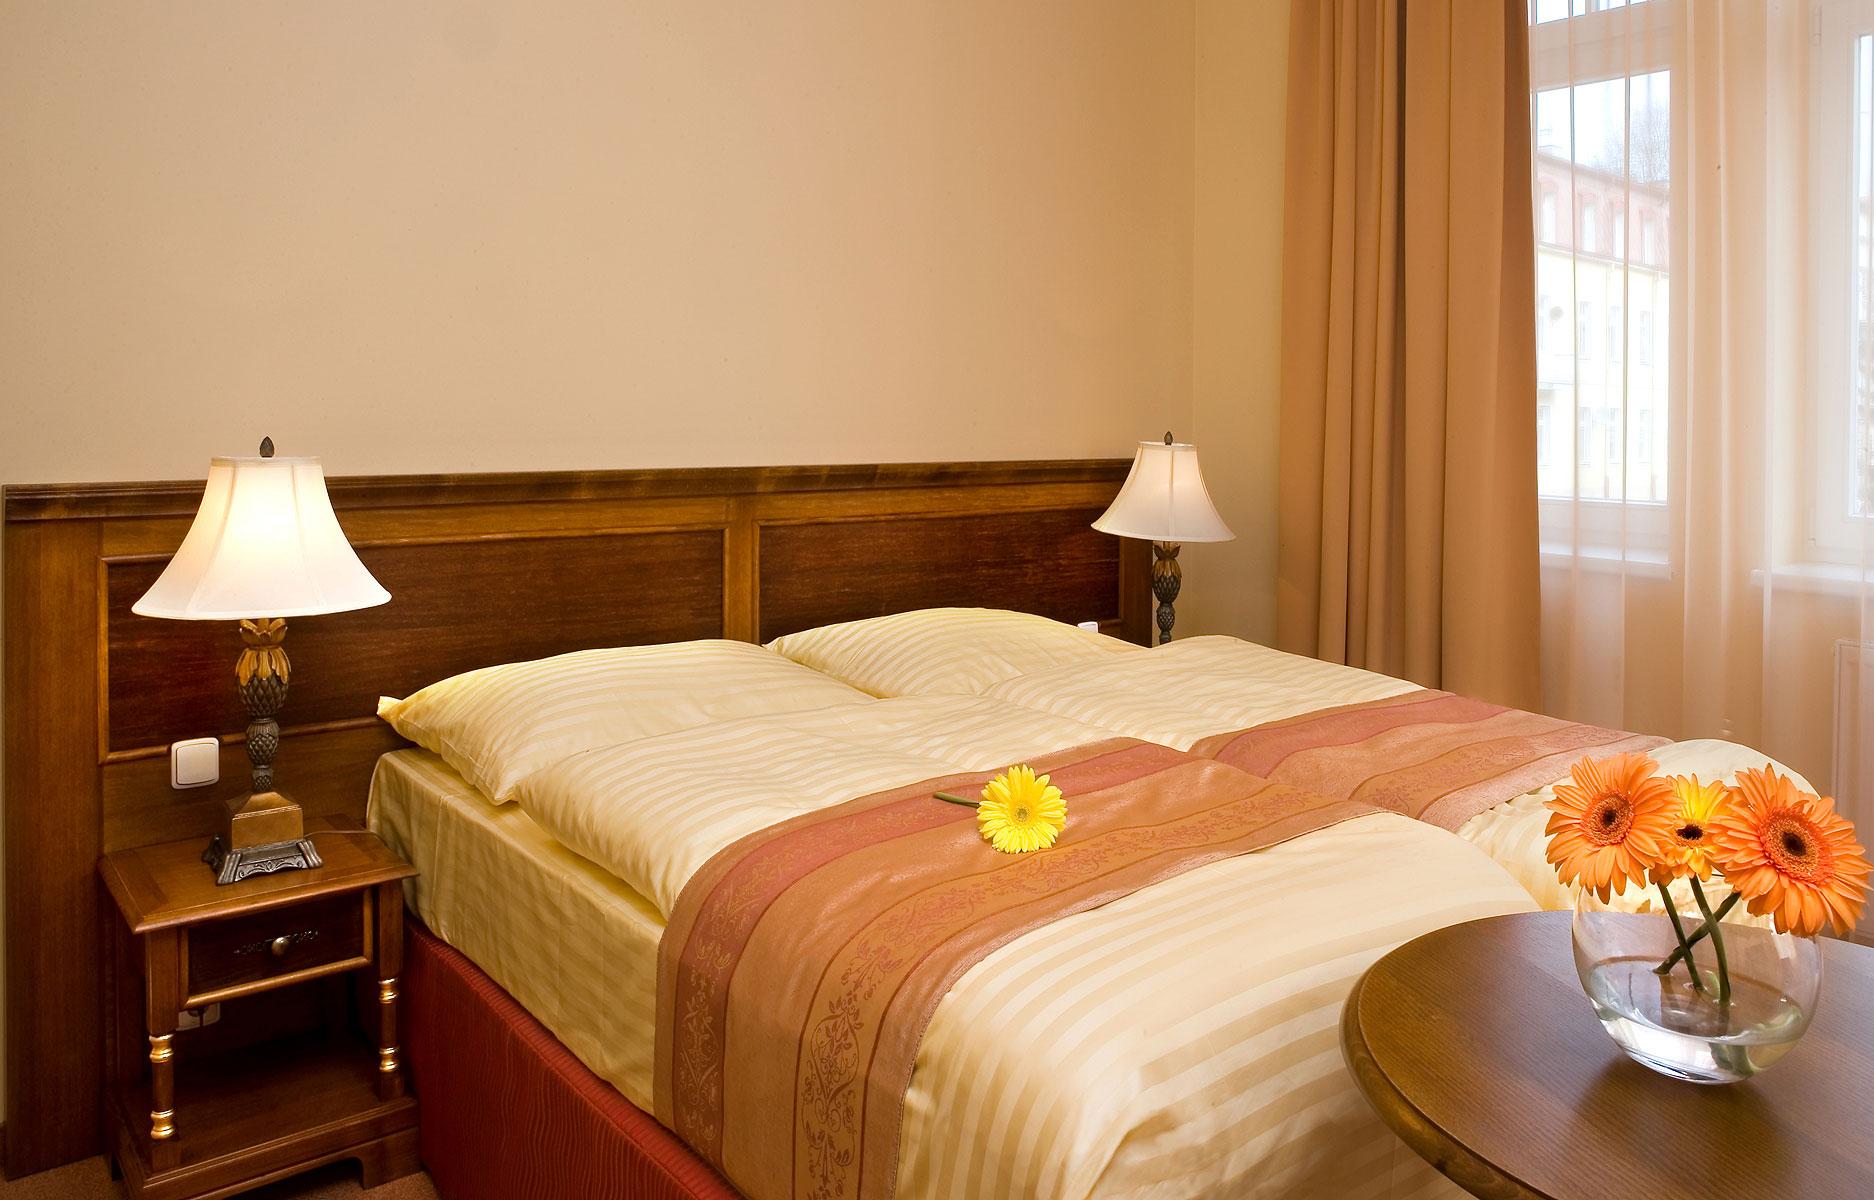 HotelContinental Mariánské Lázně